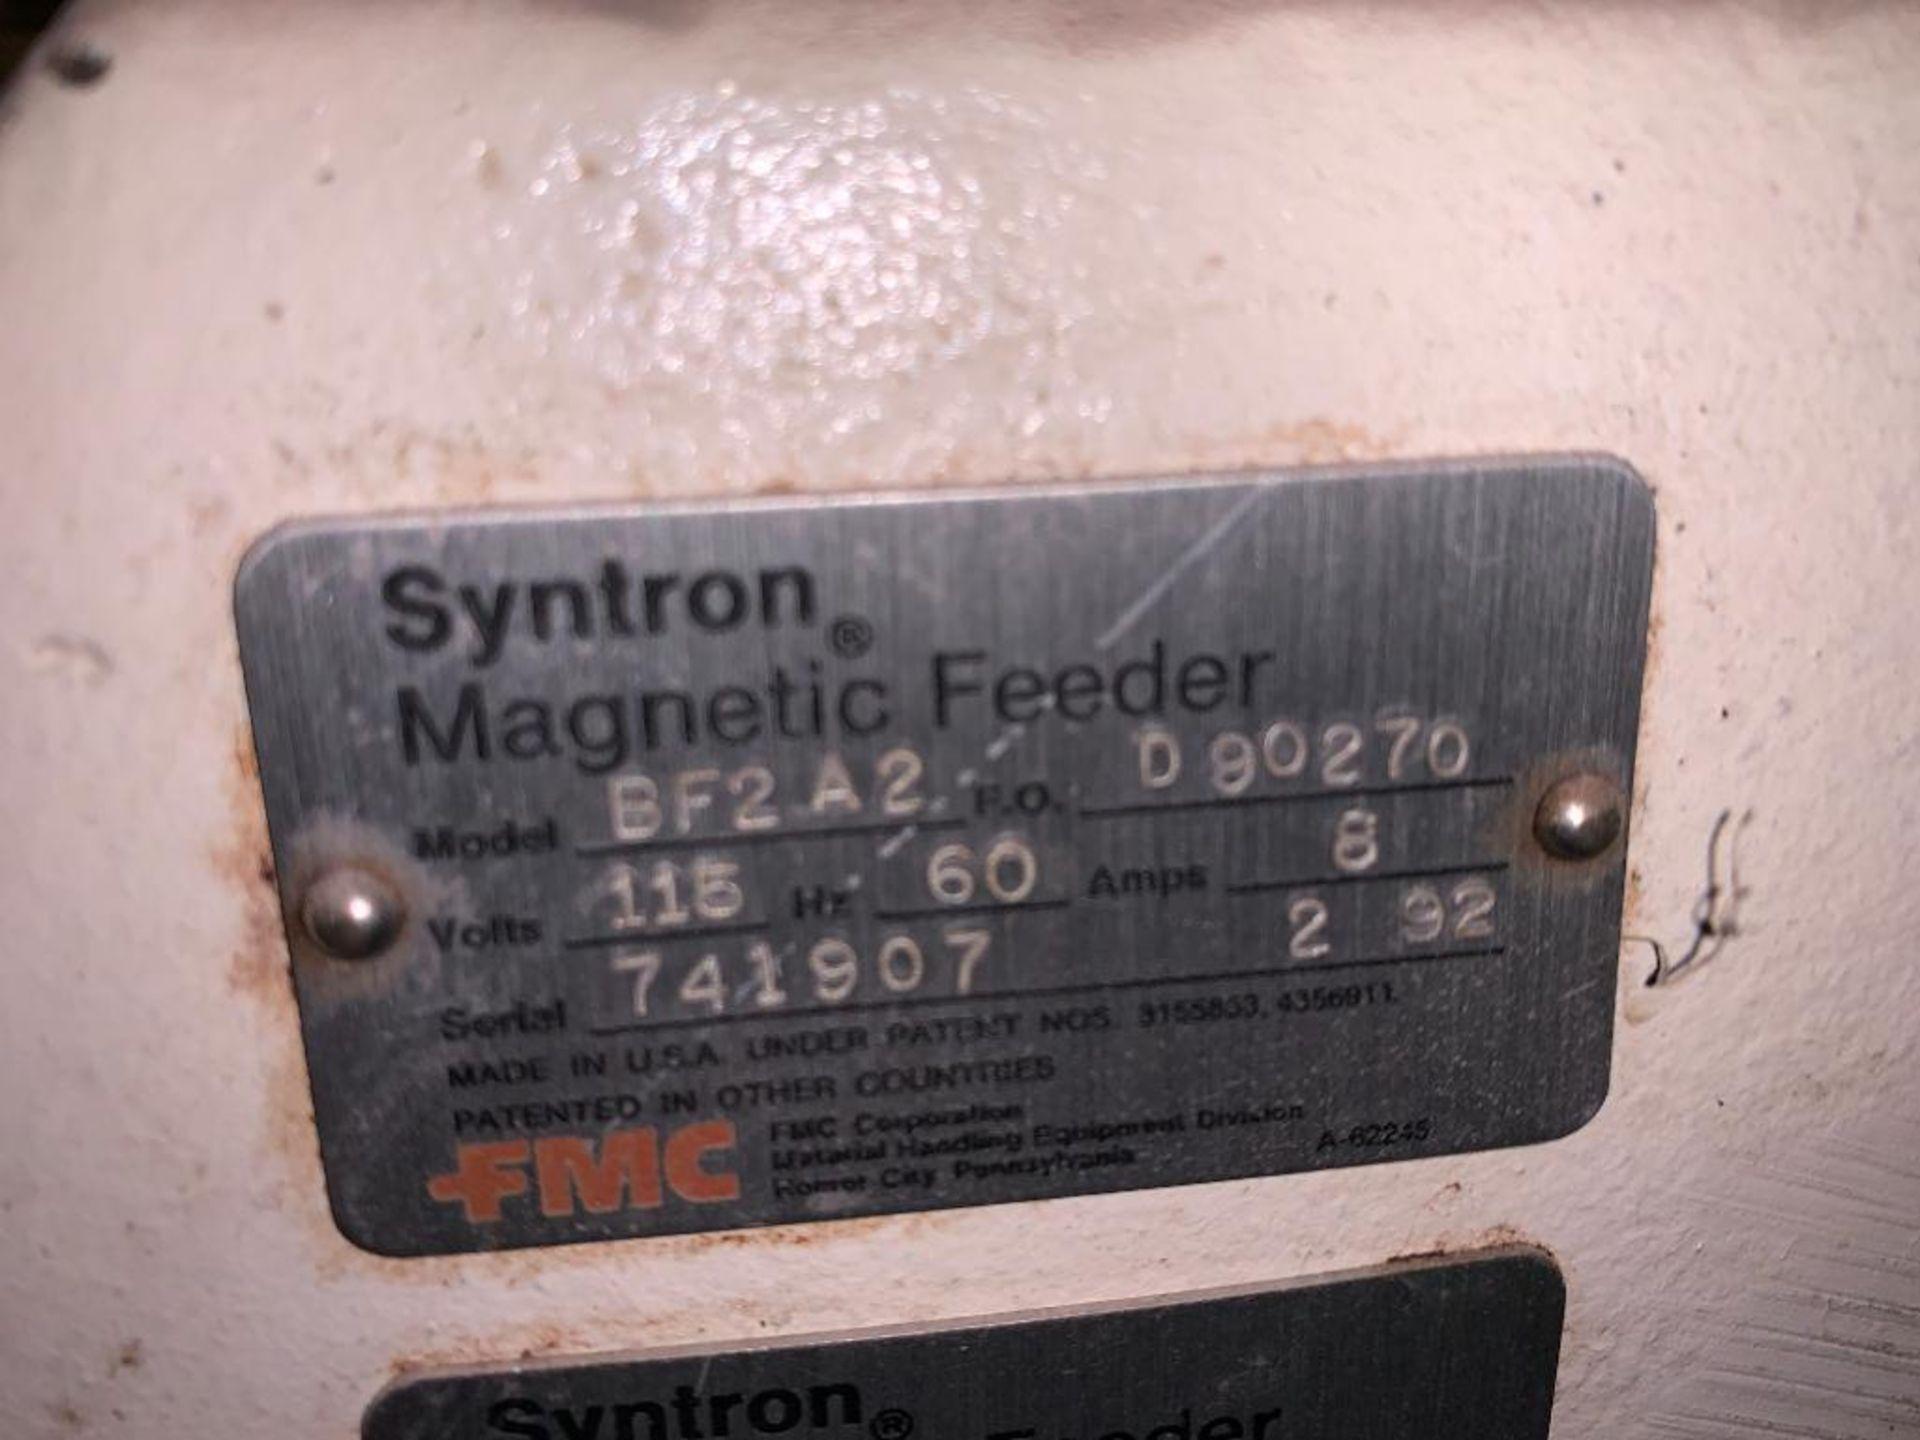 Aseeco mild steel cone bottom bulk storage bin - Image 17 of 23